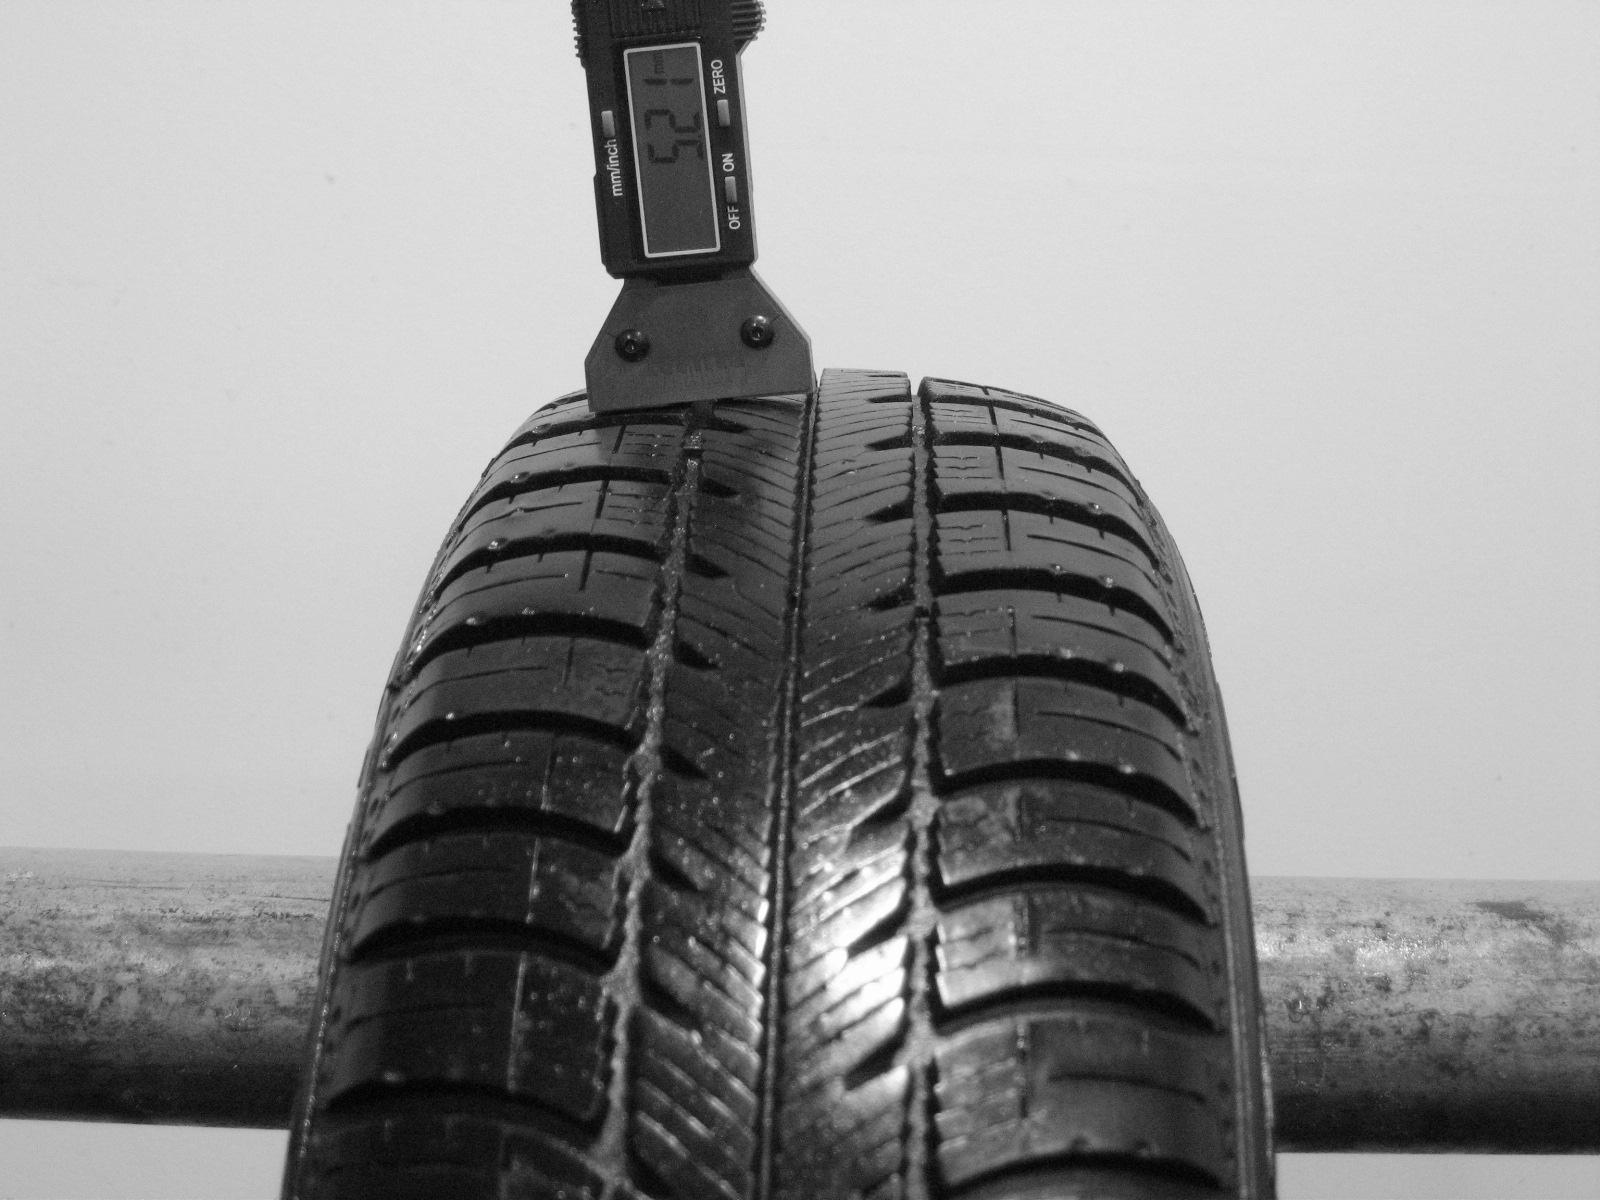 Použité-Pneu-Bazar - 155/70 R13 GOODYEAR VECTOR 5-kusovka-rezerva 3mm